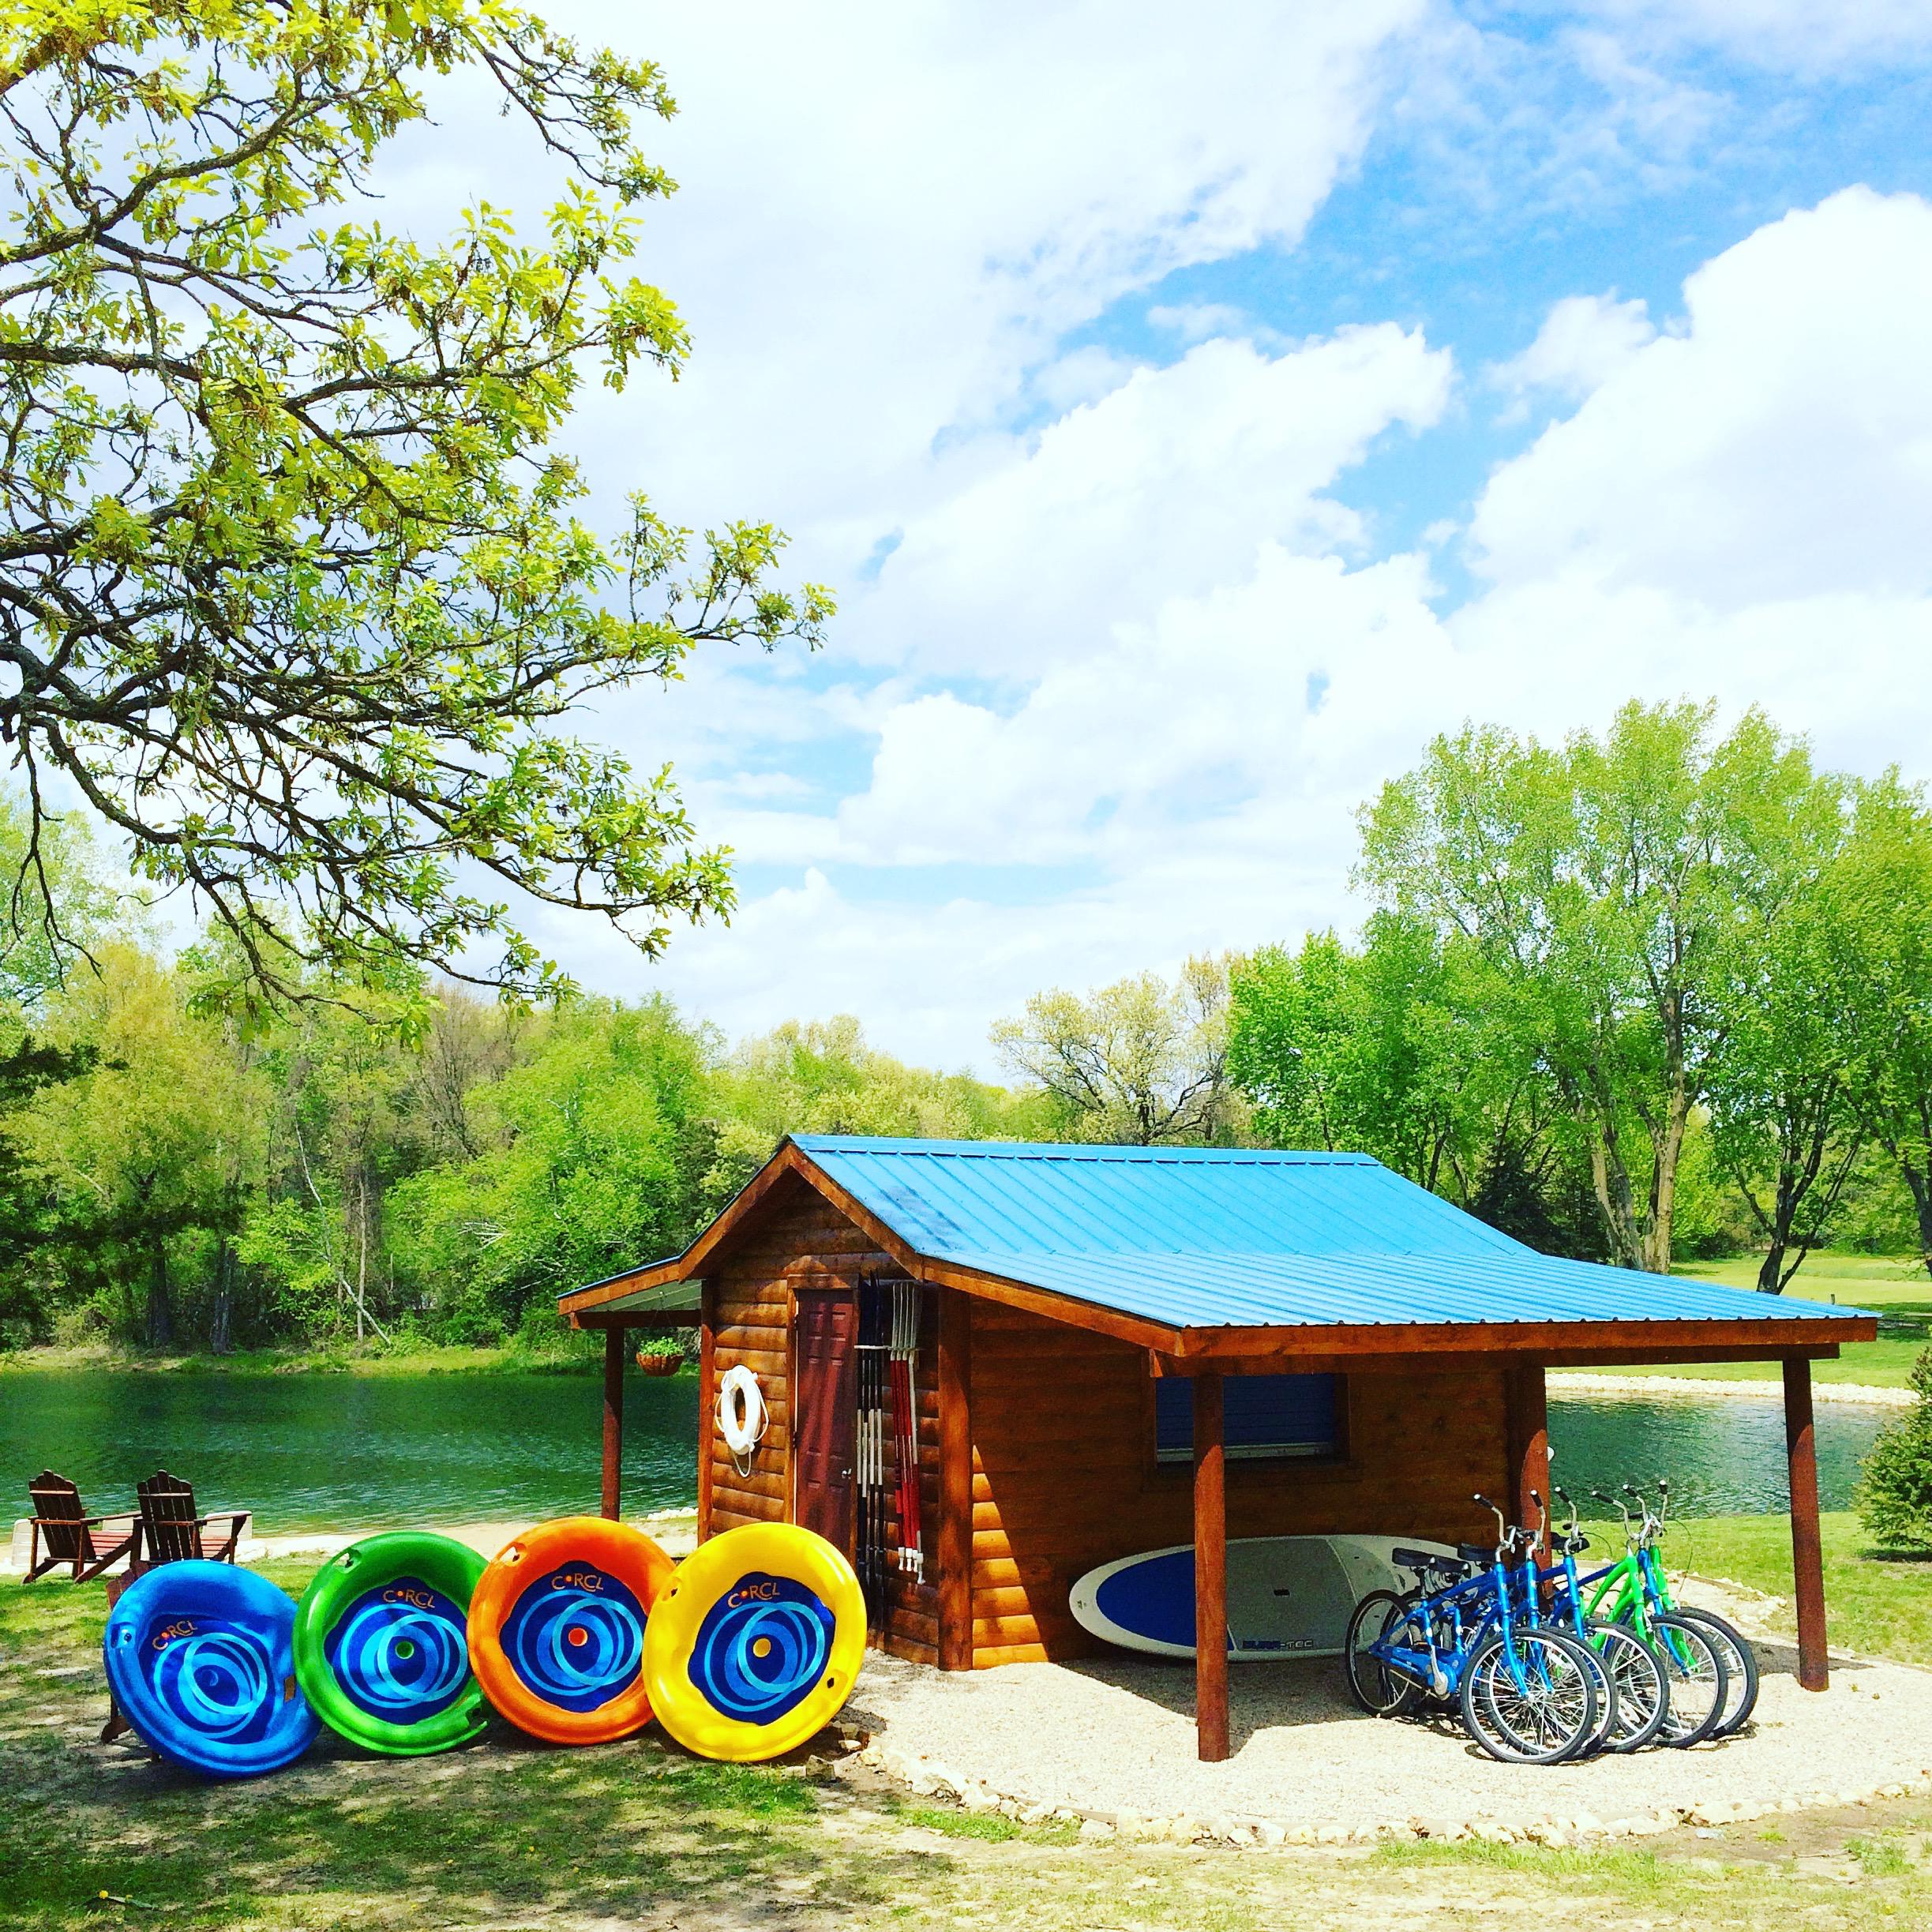 wisconsin-campground-photo.jpg